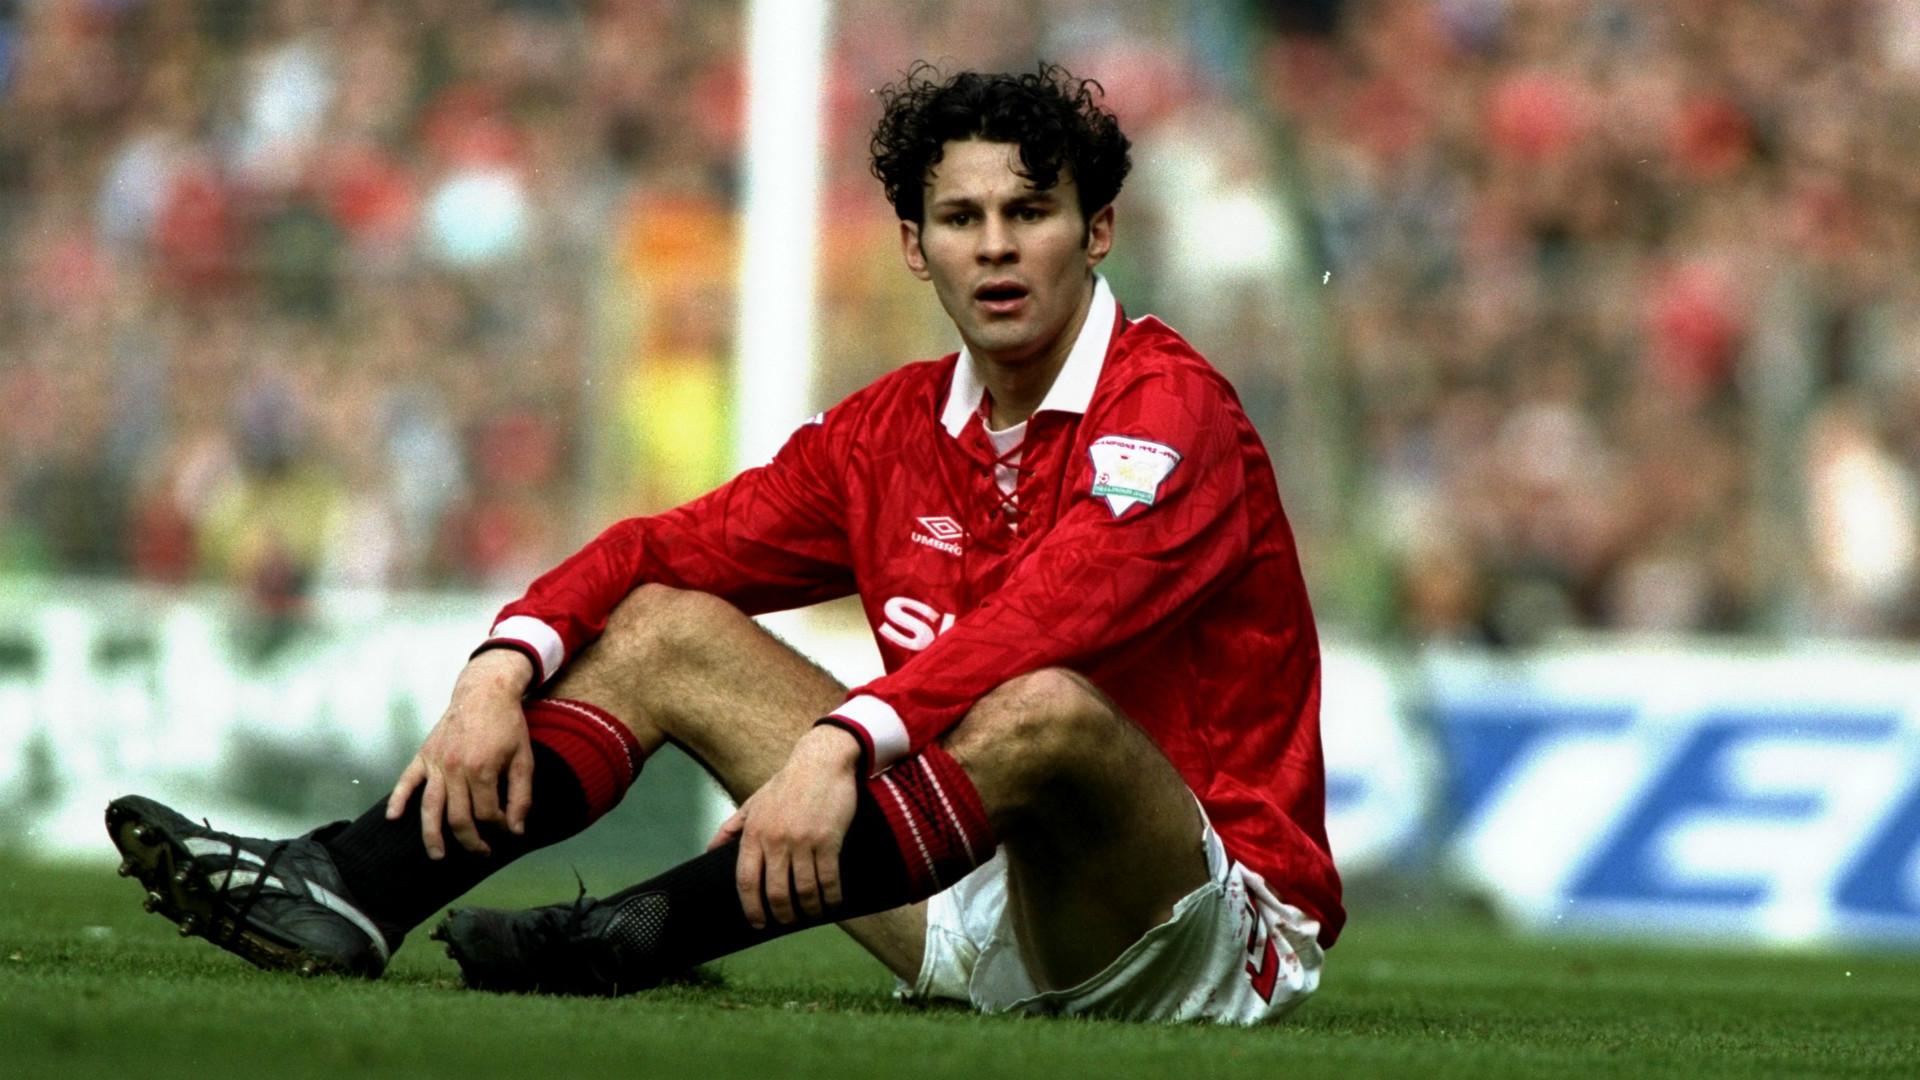 Ryan Giggs Manchester United 1994